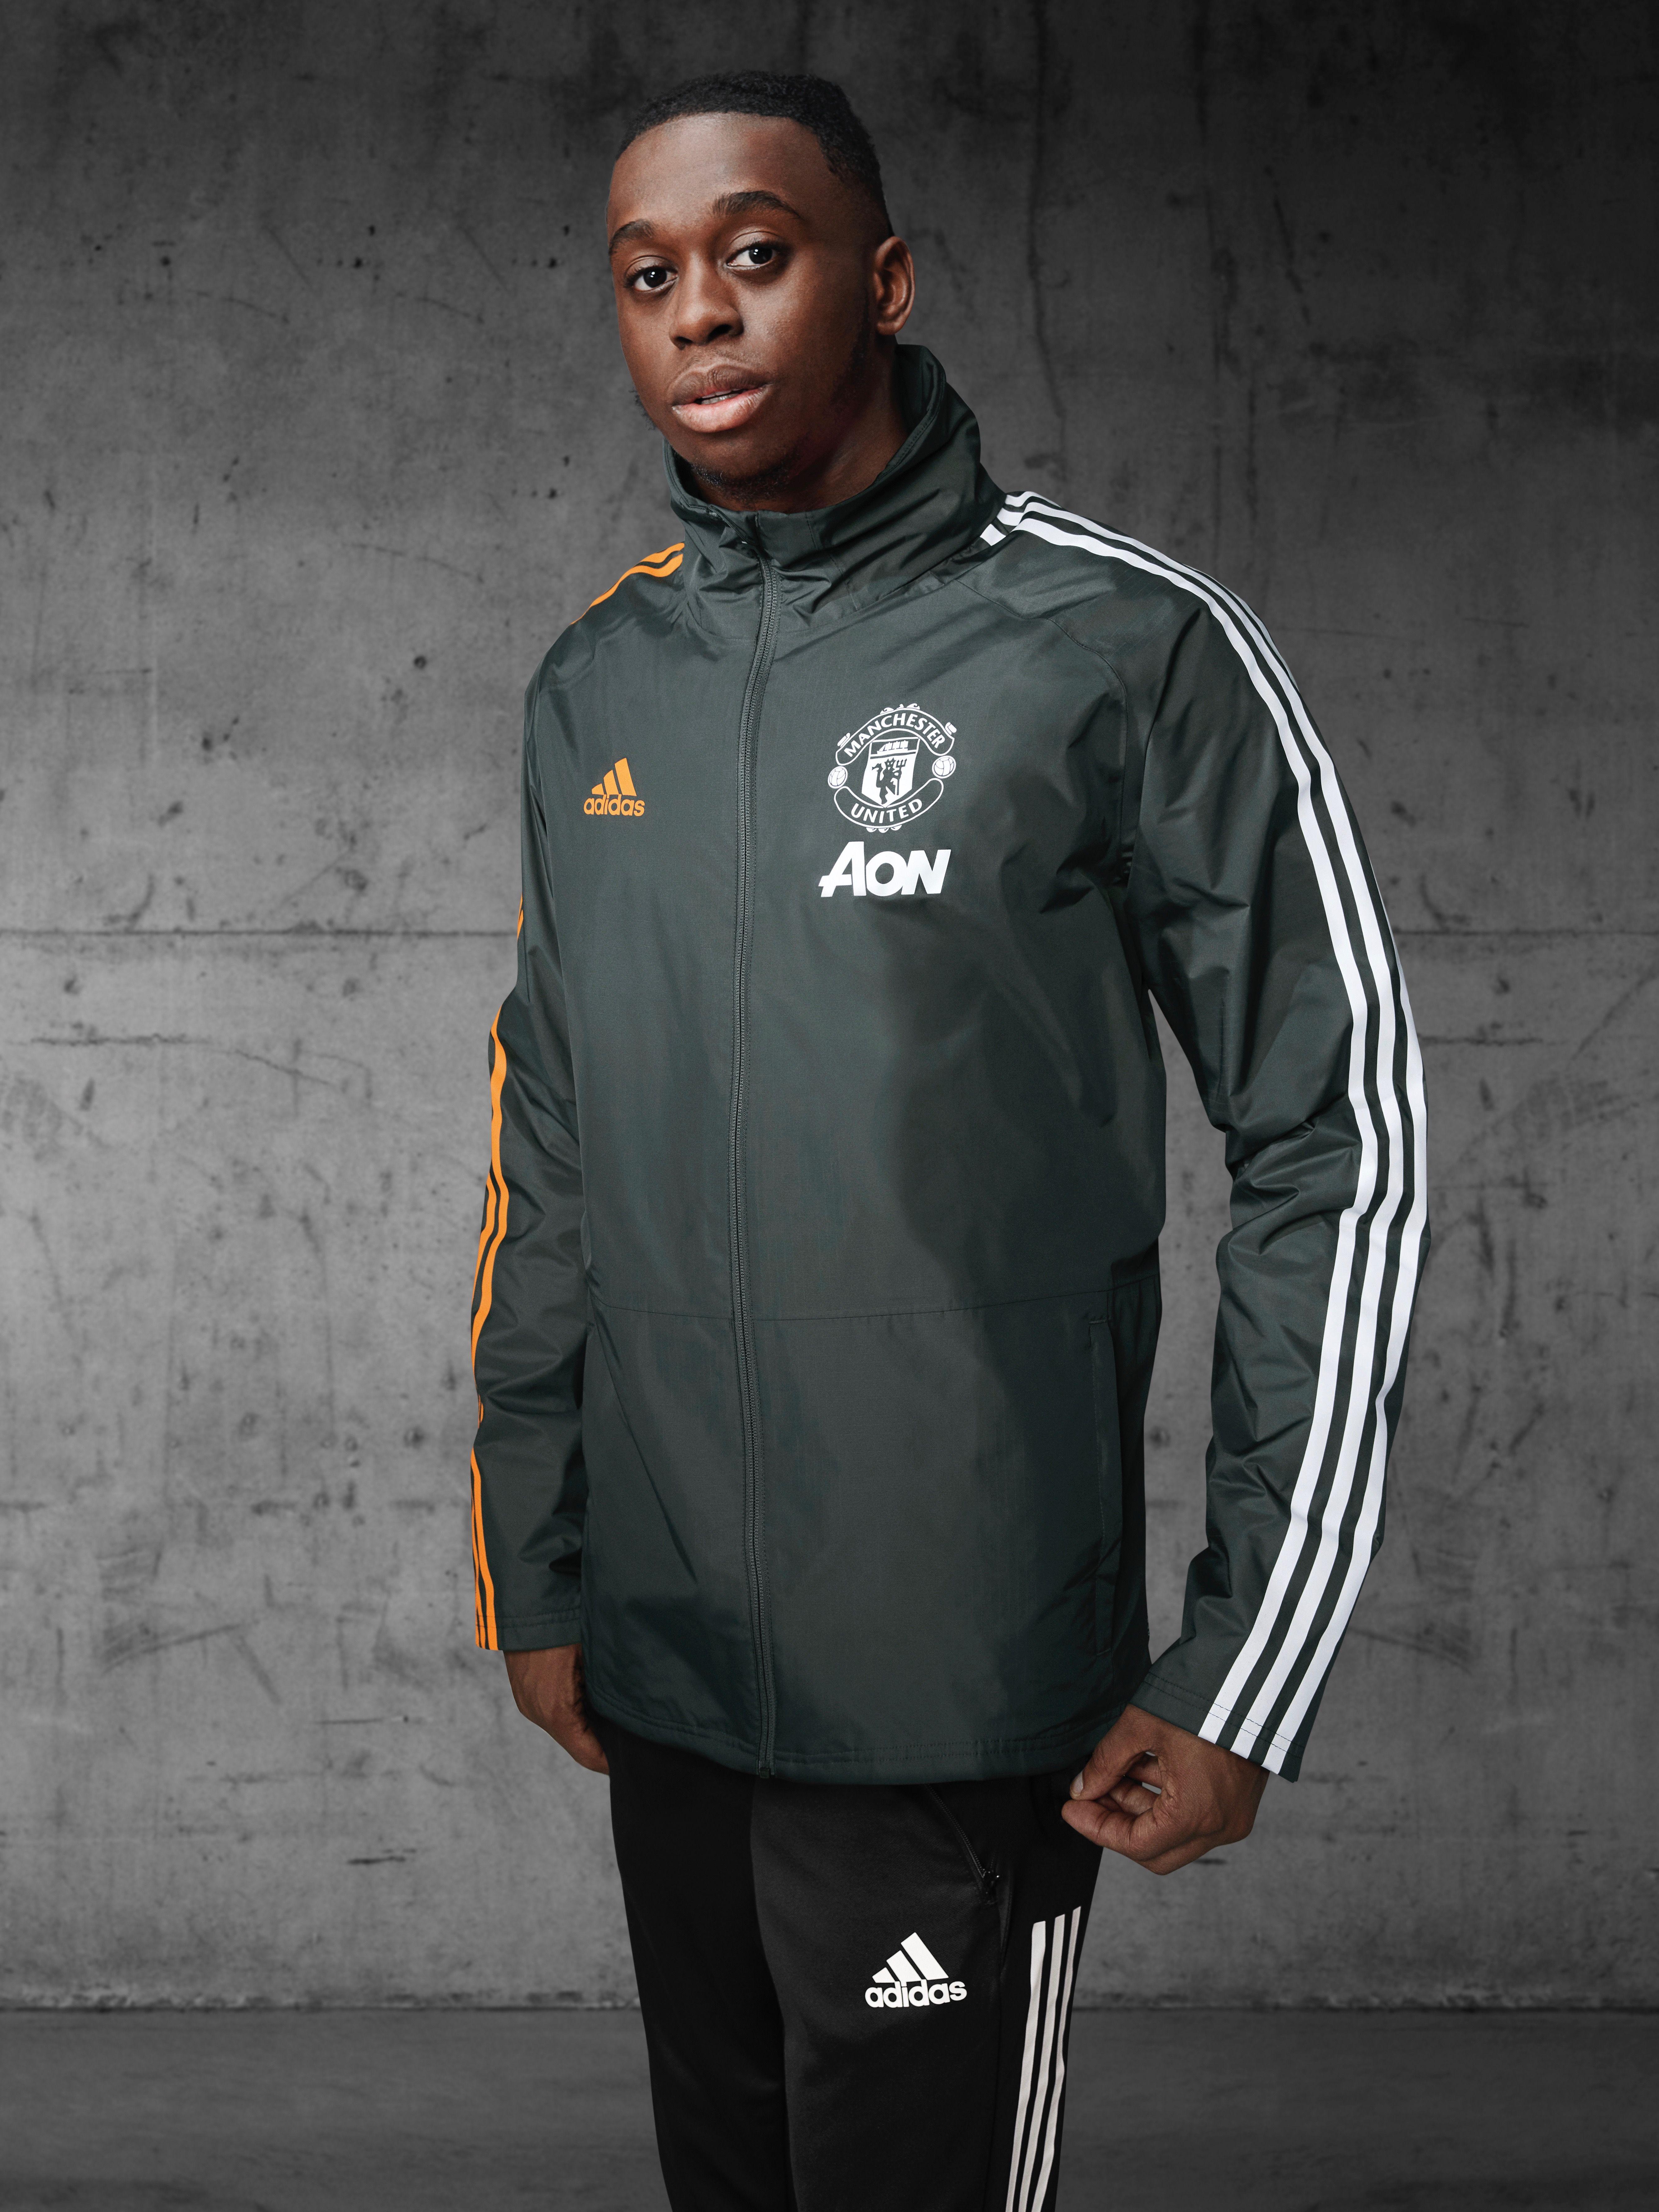 Vamos fuego Cocinando  Manchester United Jerseys, Apparel & Gear | adidas US | Soccer pants, Adidas  football, Adidas